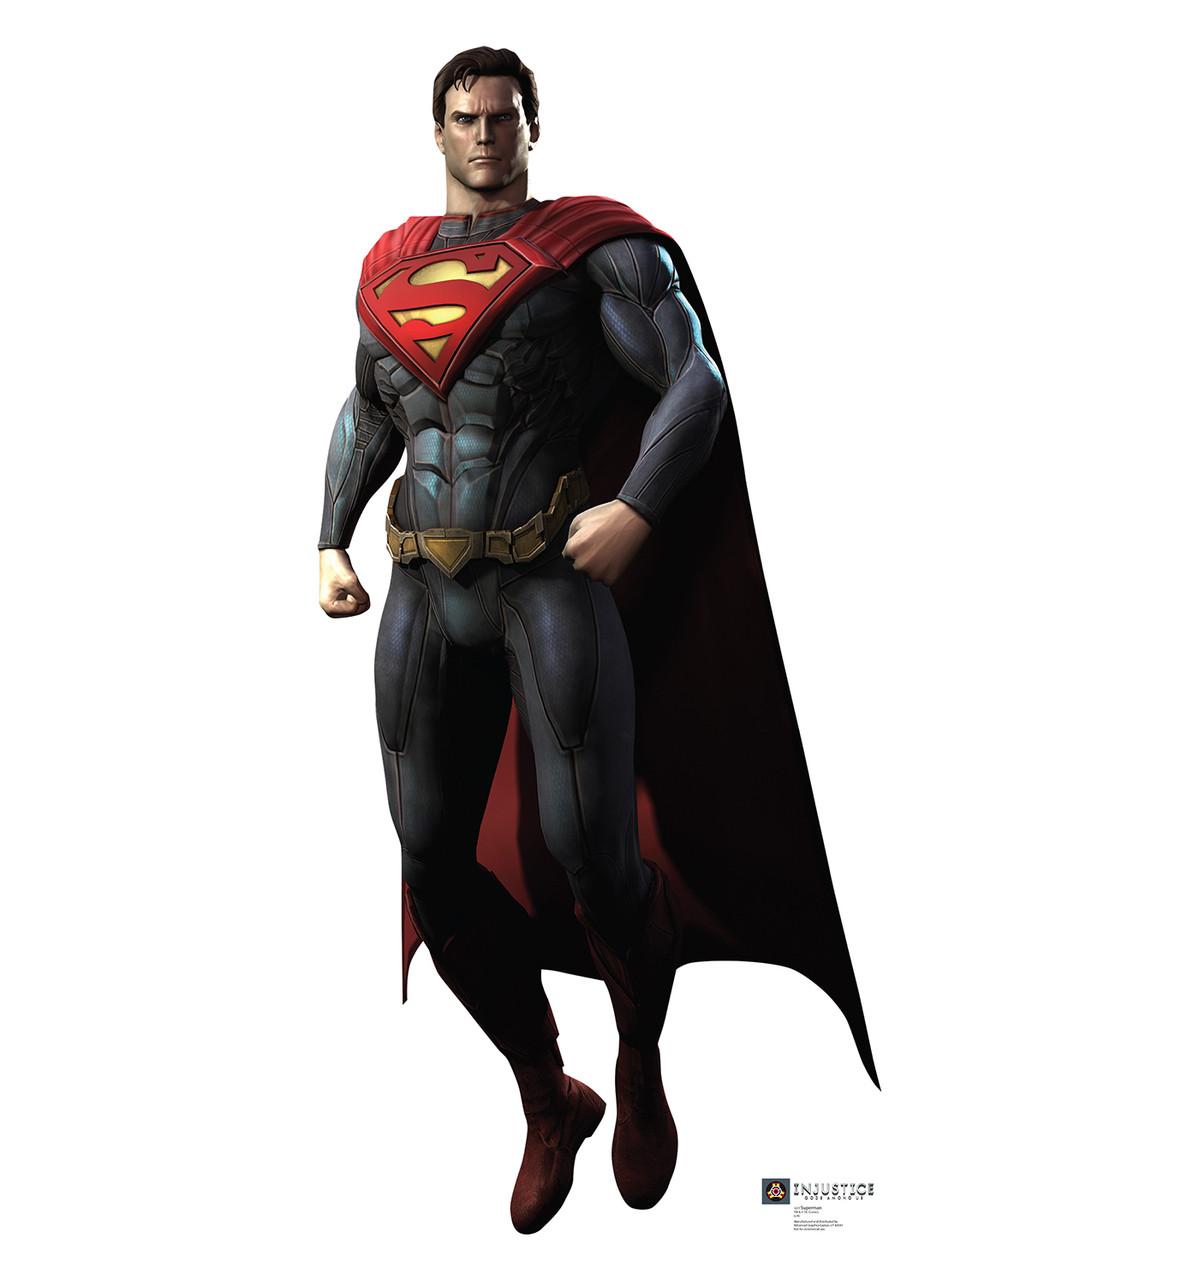 Life-size Superman - Injustice Gods Among Us Cardboard Standup | Cardboard Cutout